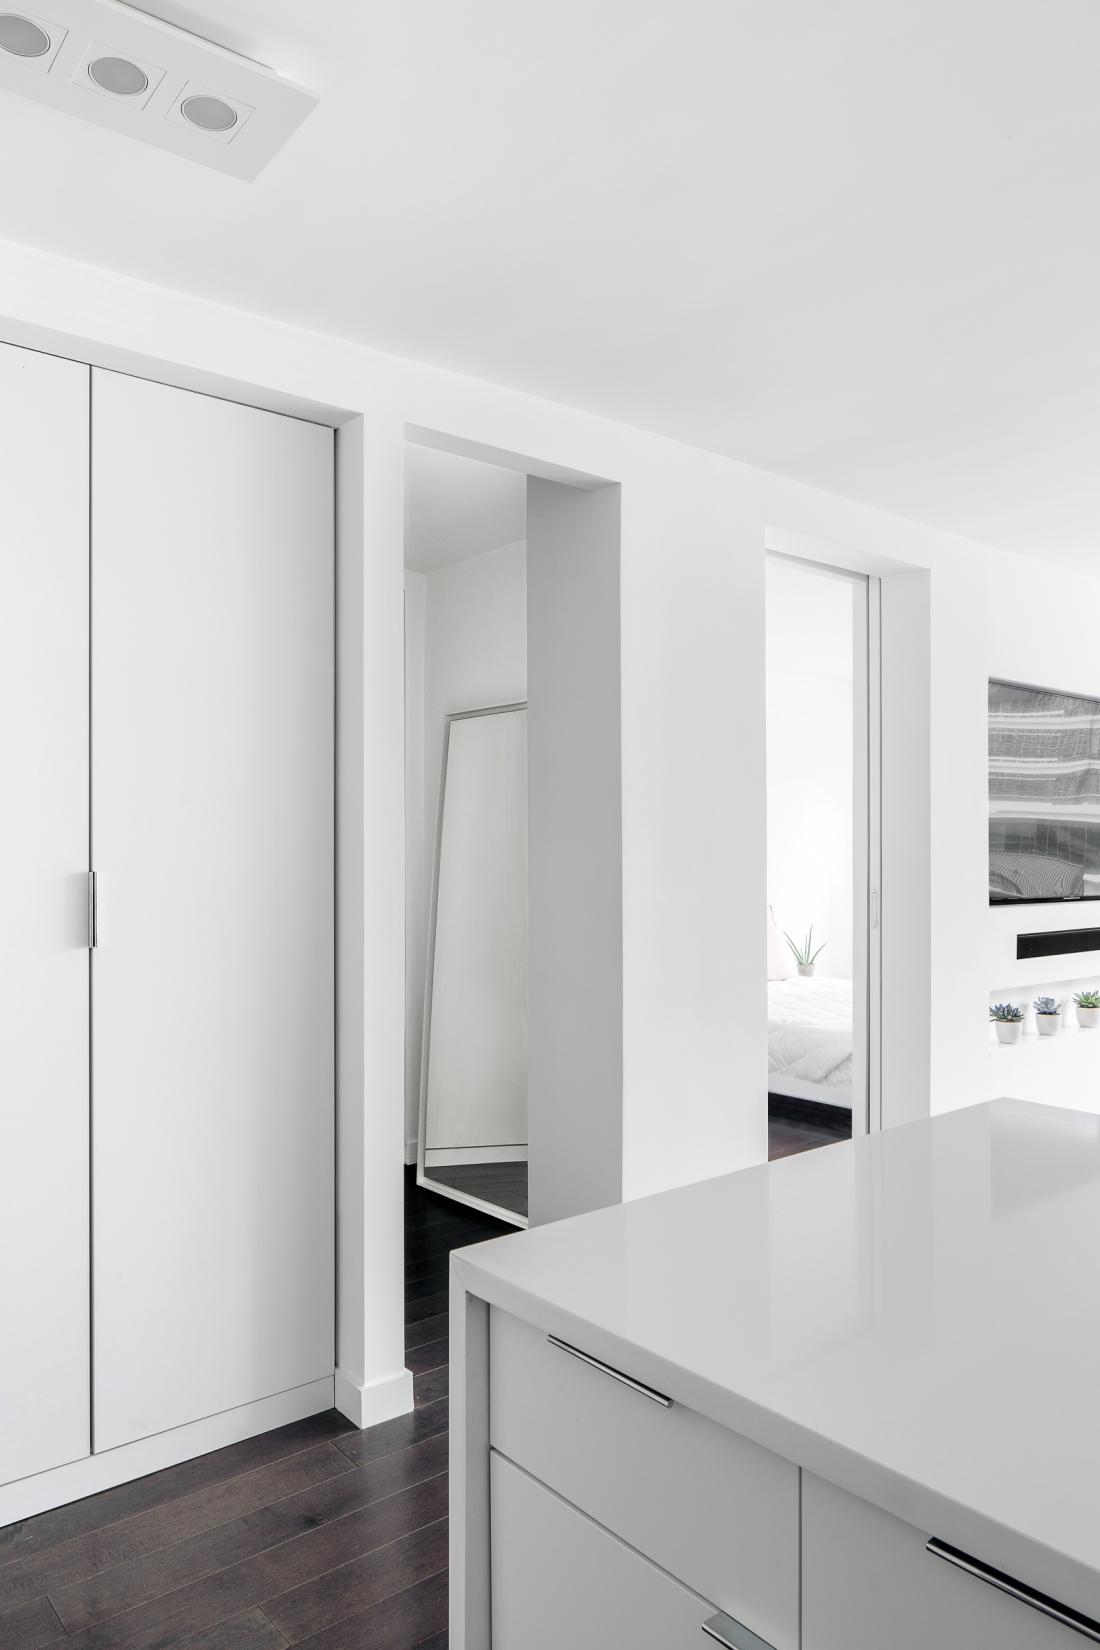 SB_JBA_402-Closet-White-1100x1650.jpg